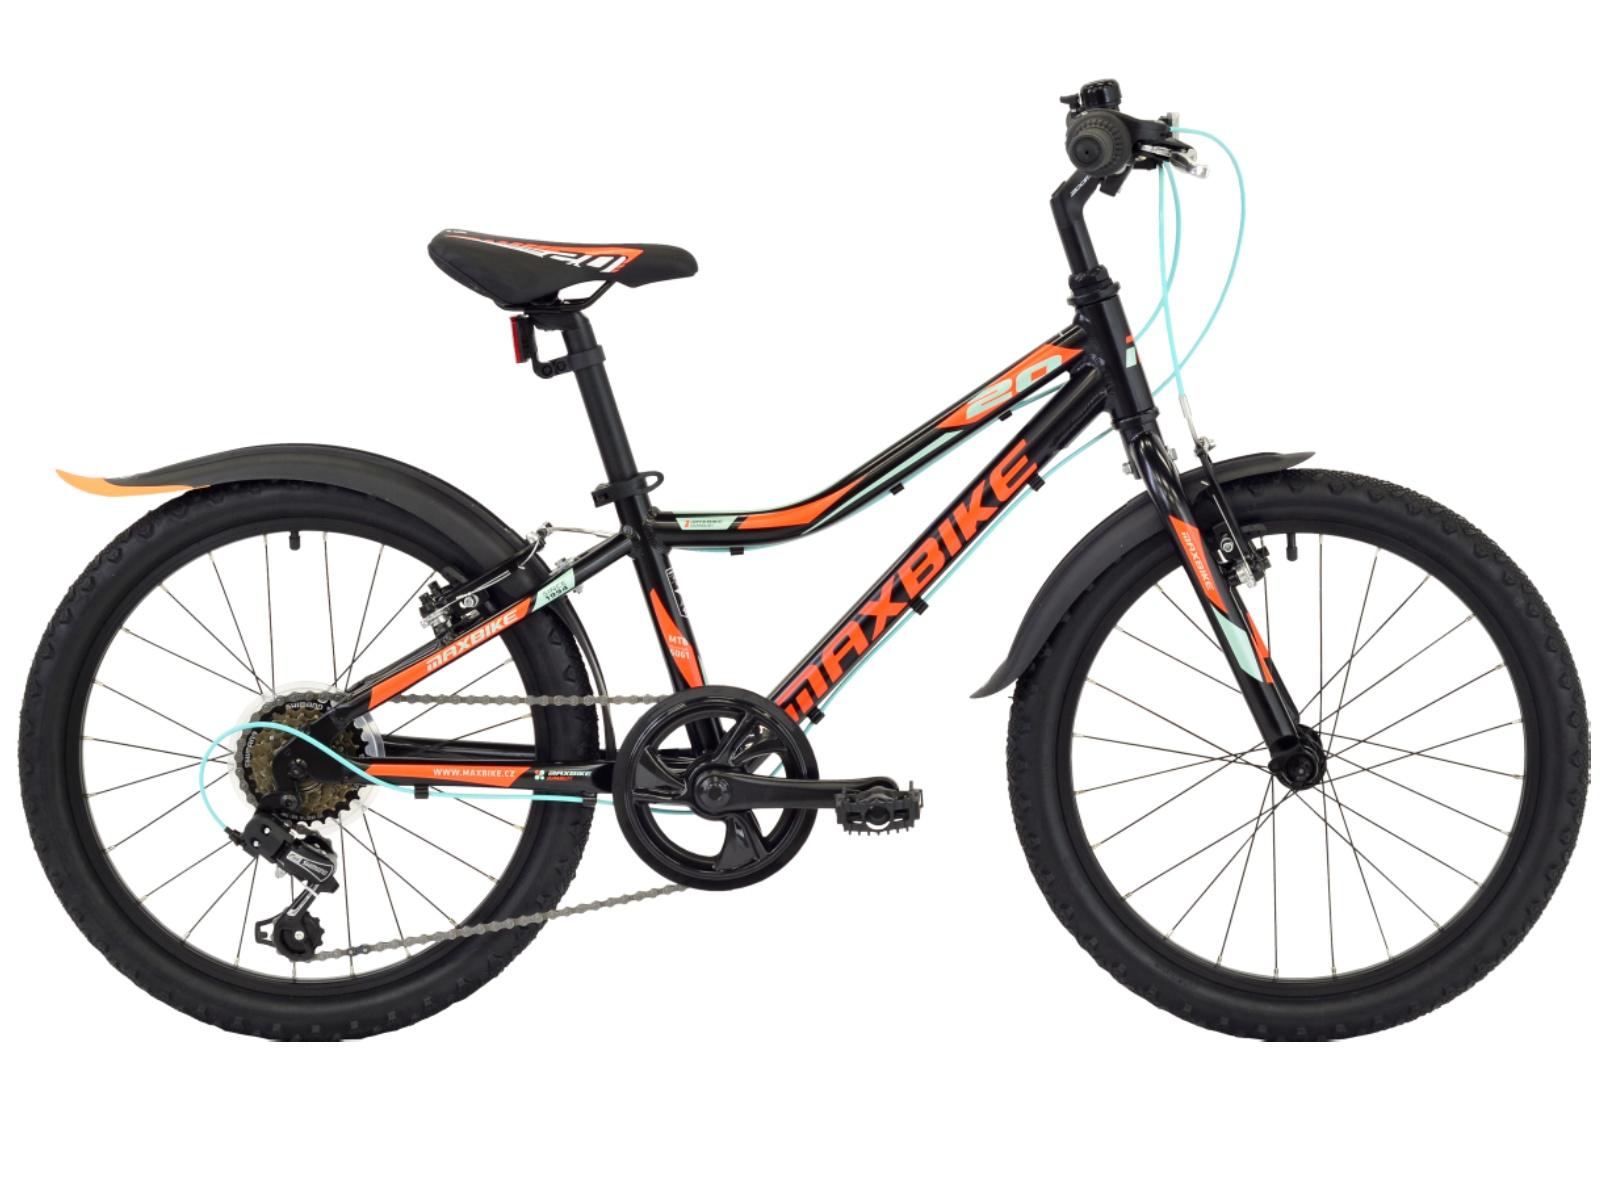 "Detský bicykel MAXBIKE Junior 20 ""- matne čierny"